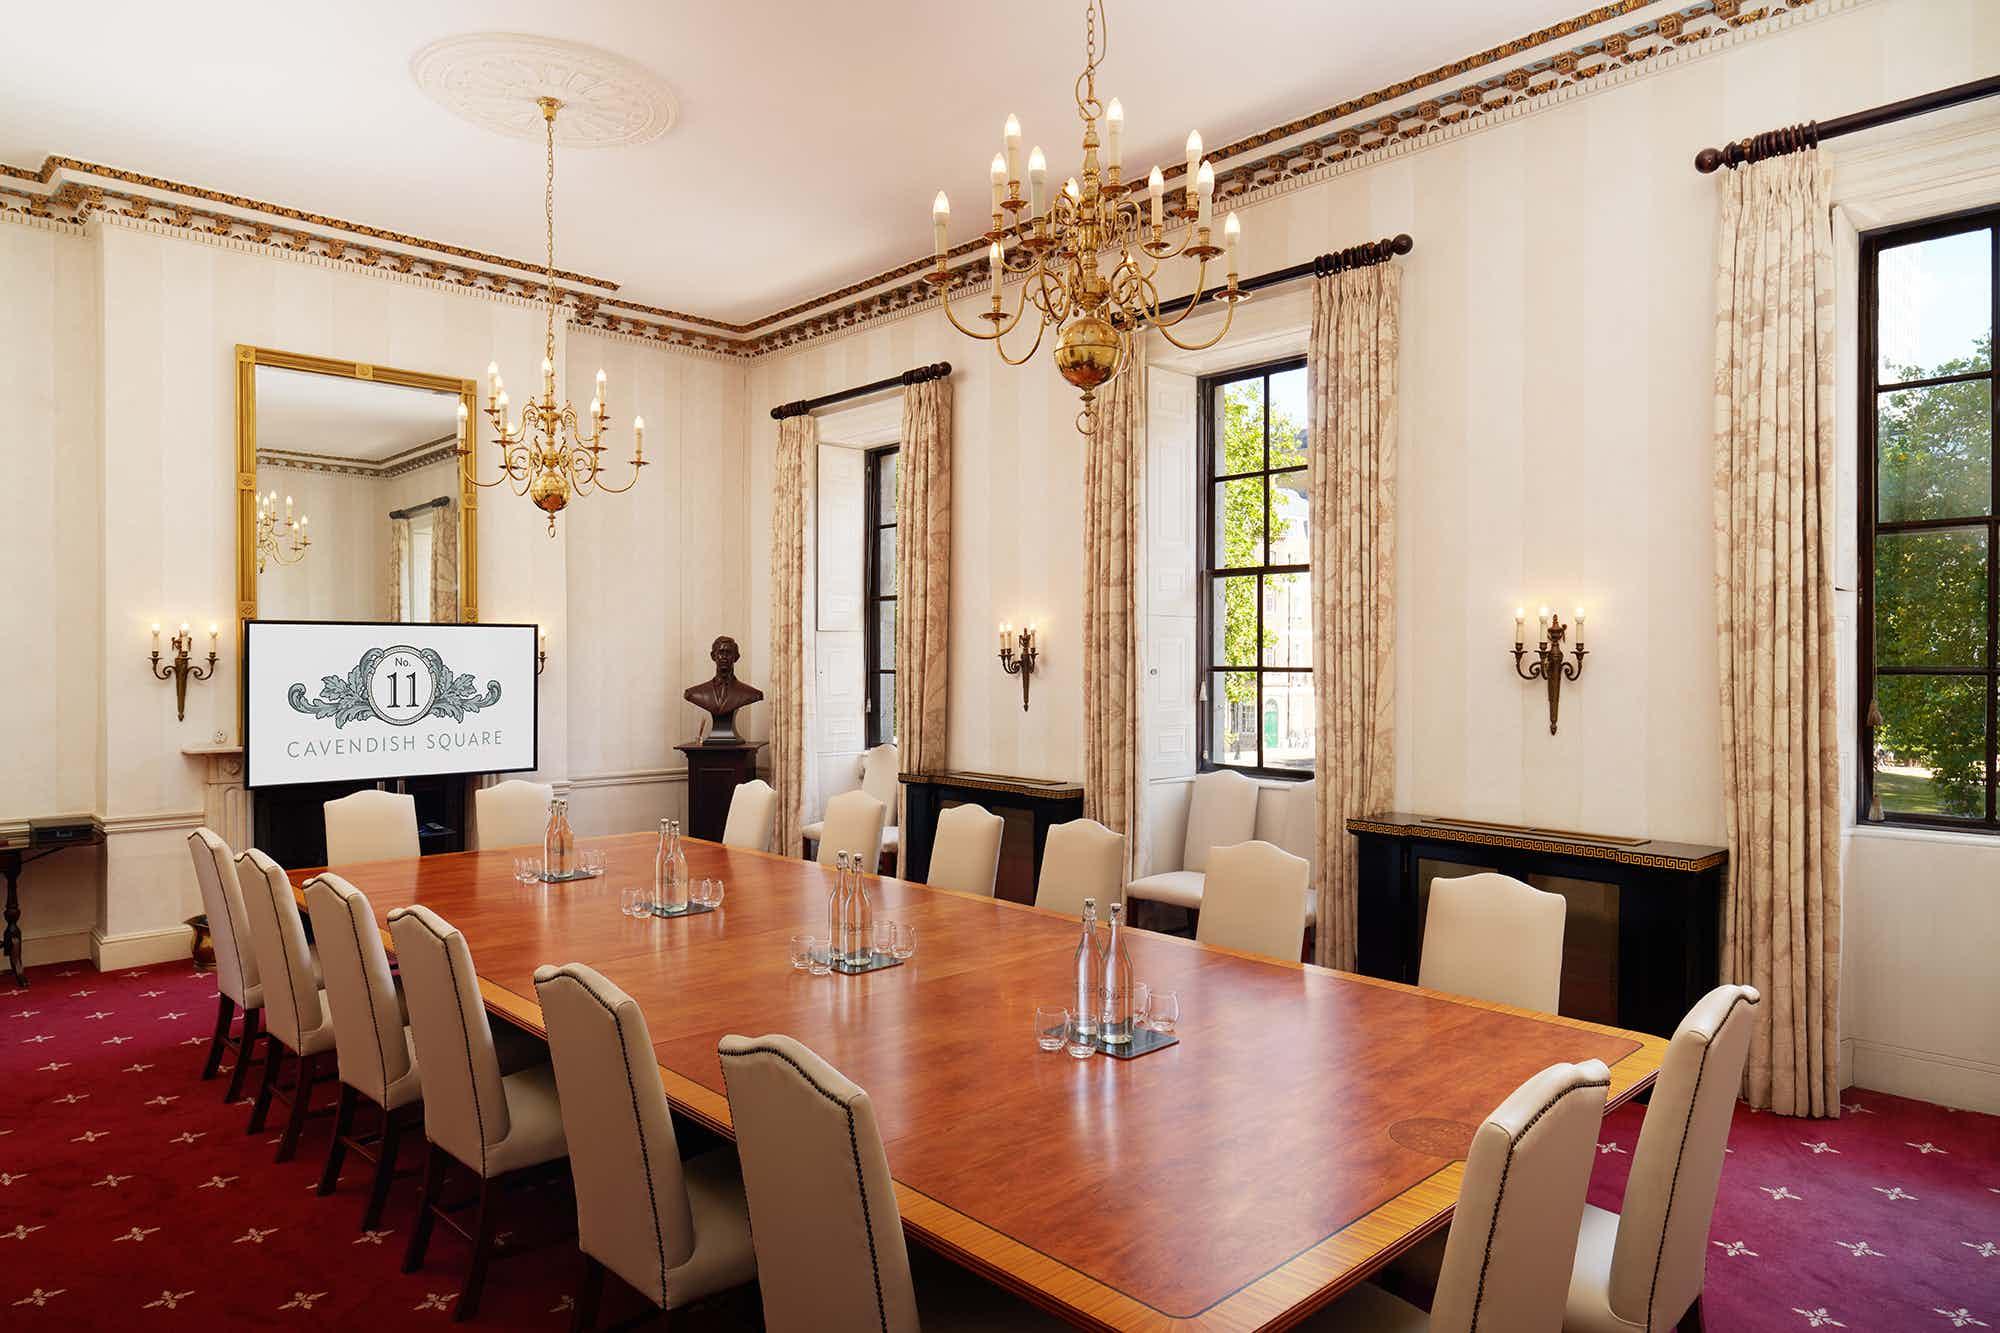 Presidents Room, No.11 Cavendish Square